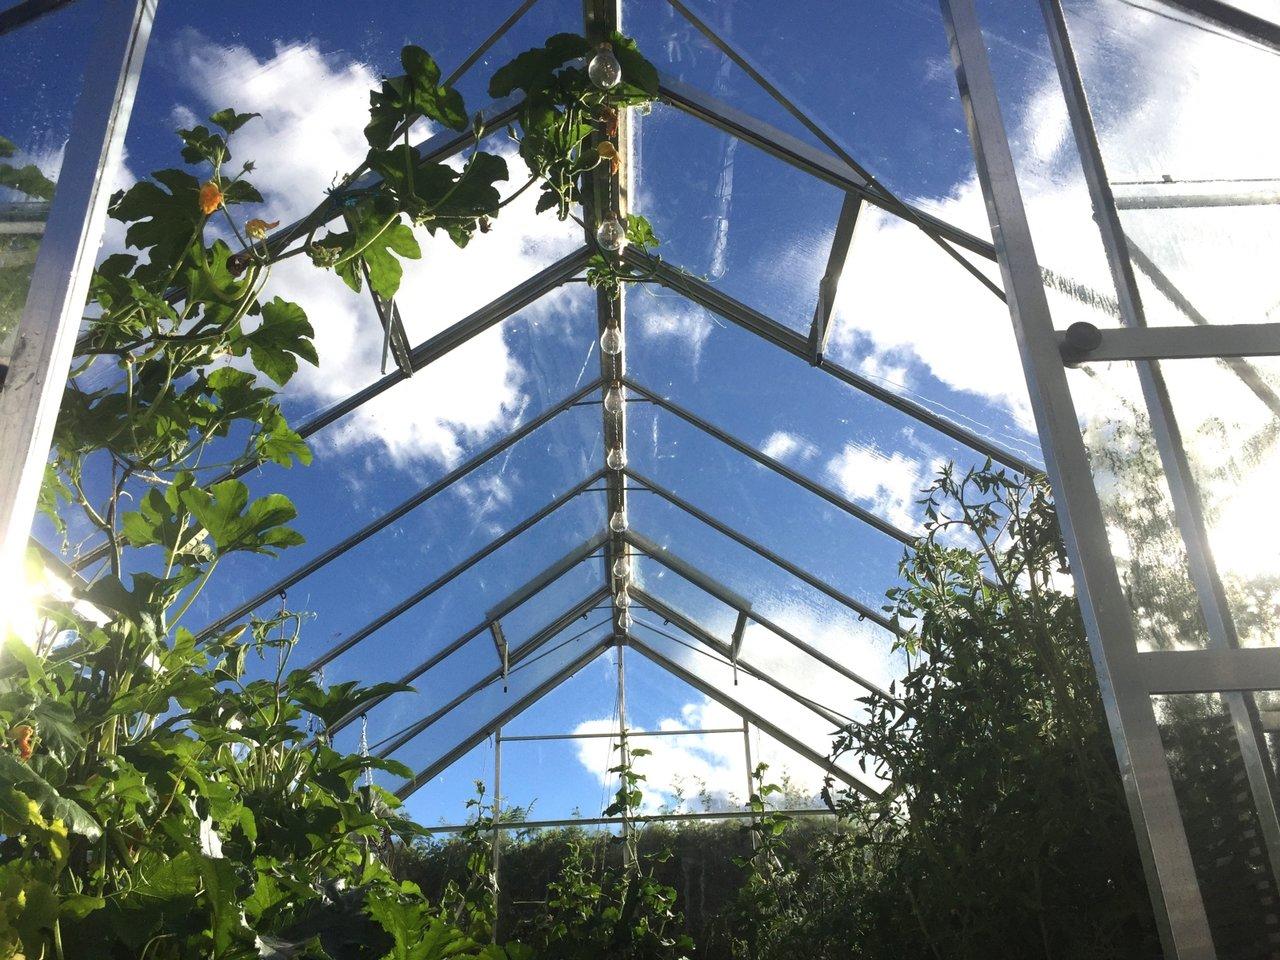 odla i växthus tips